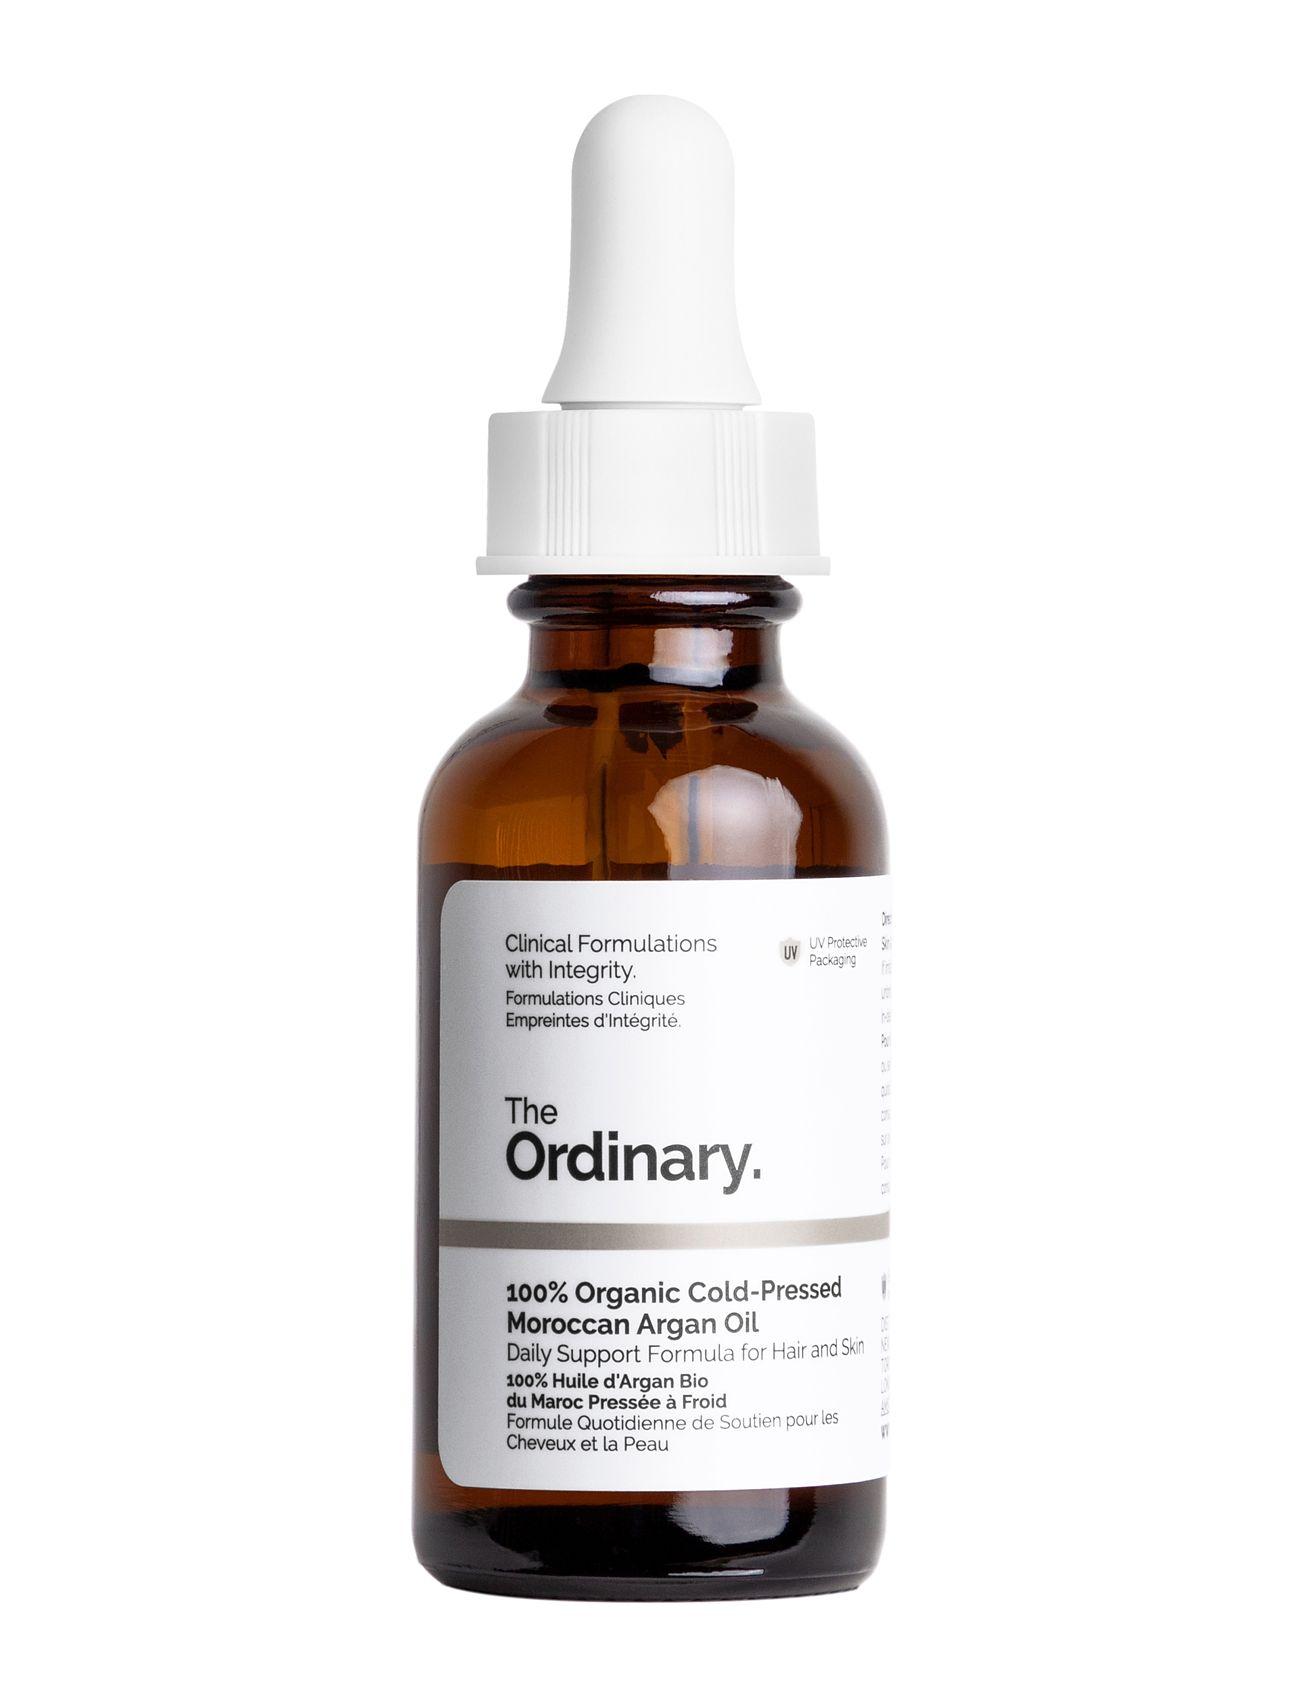 Image of 100% Organic Cold-Pressed Moroccan Argan Oil (3074541317)